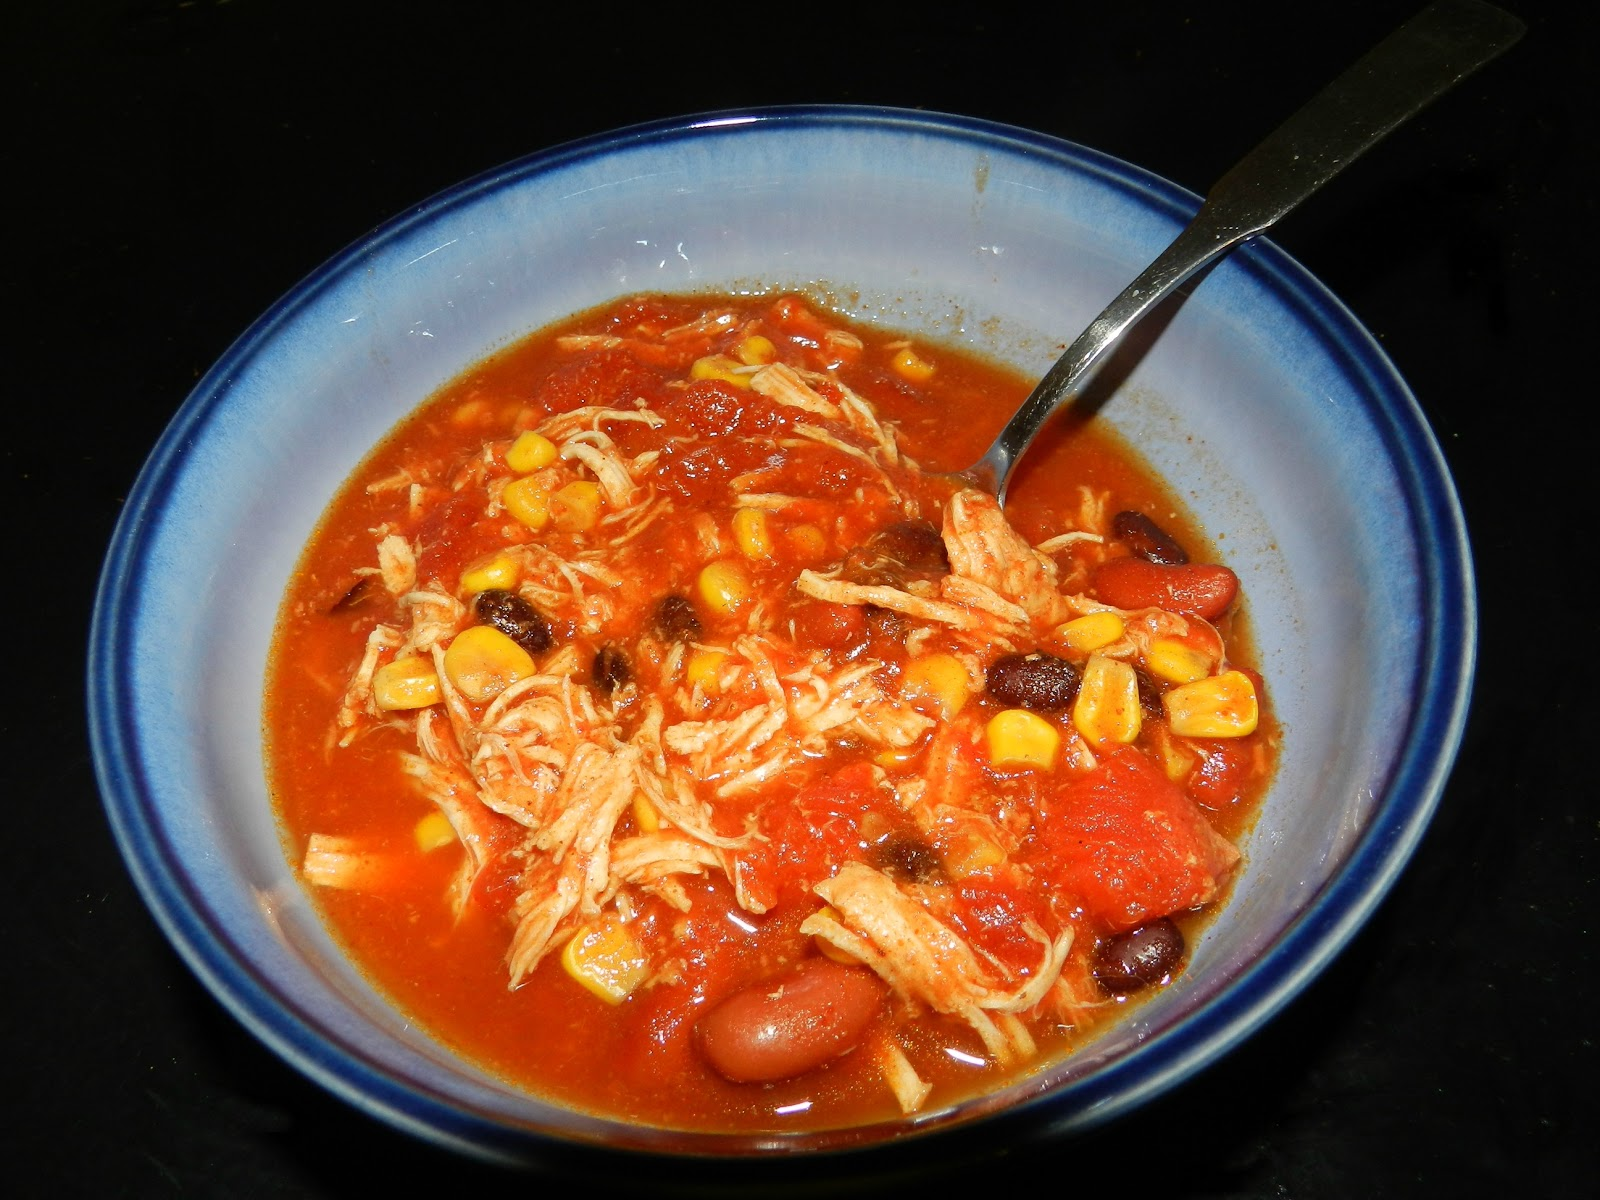 More Than Just A Casserole: Chicken Taco Chili